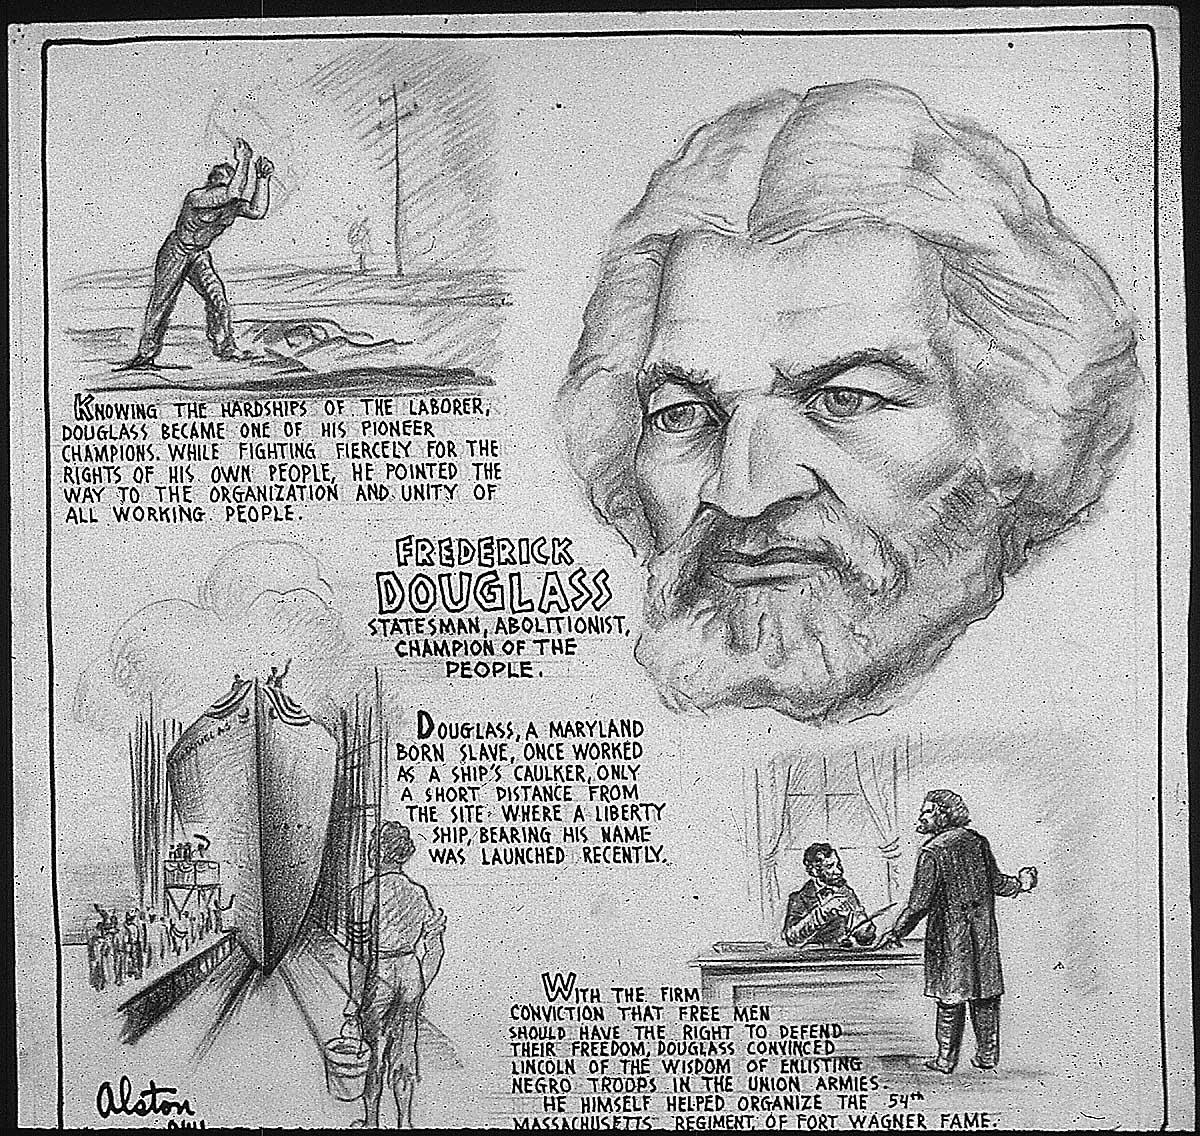 Frederick Douglass Illustrated